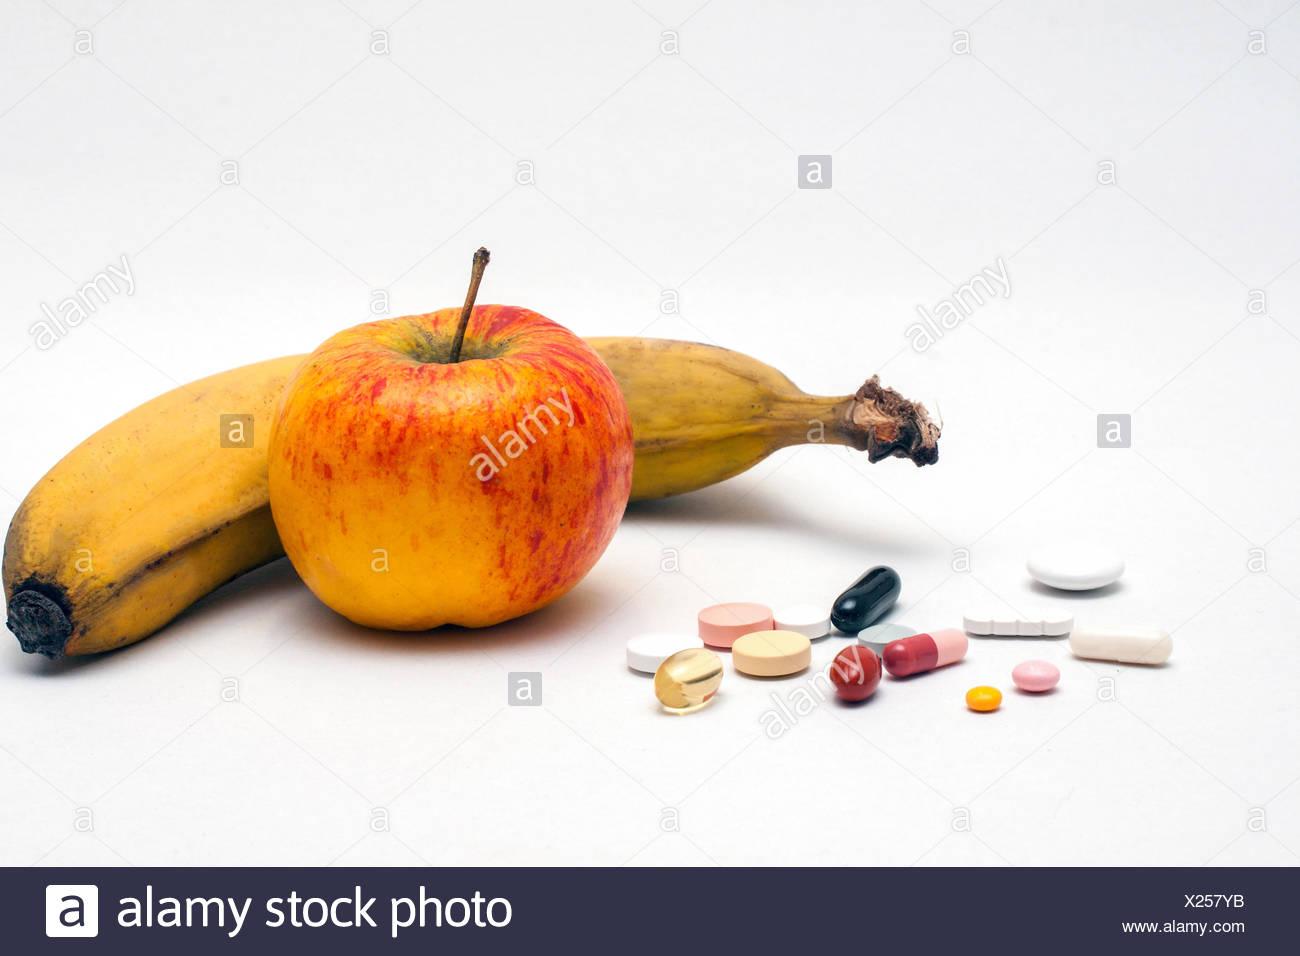 Verschiedene bunte Tabletten, Apfel und Banane, isoliert Banque D'Images